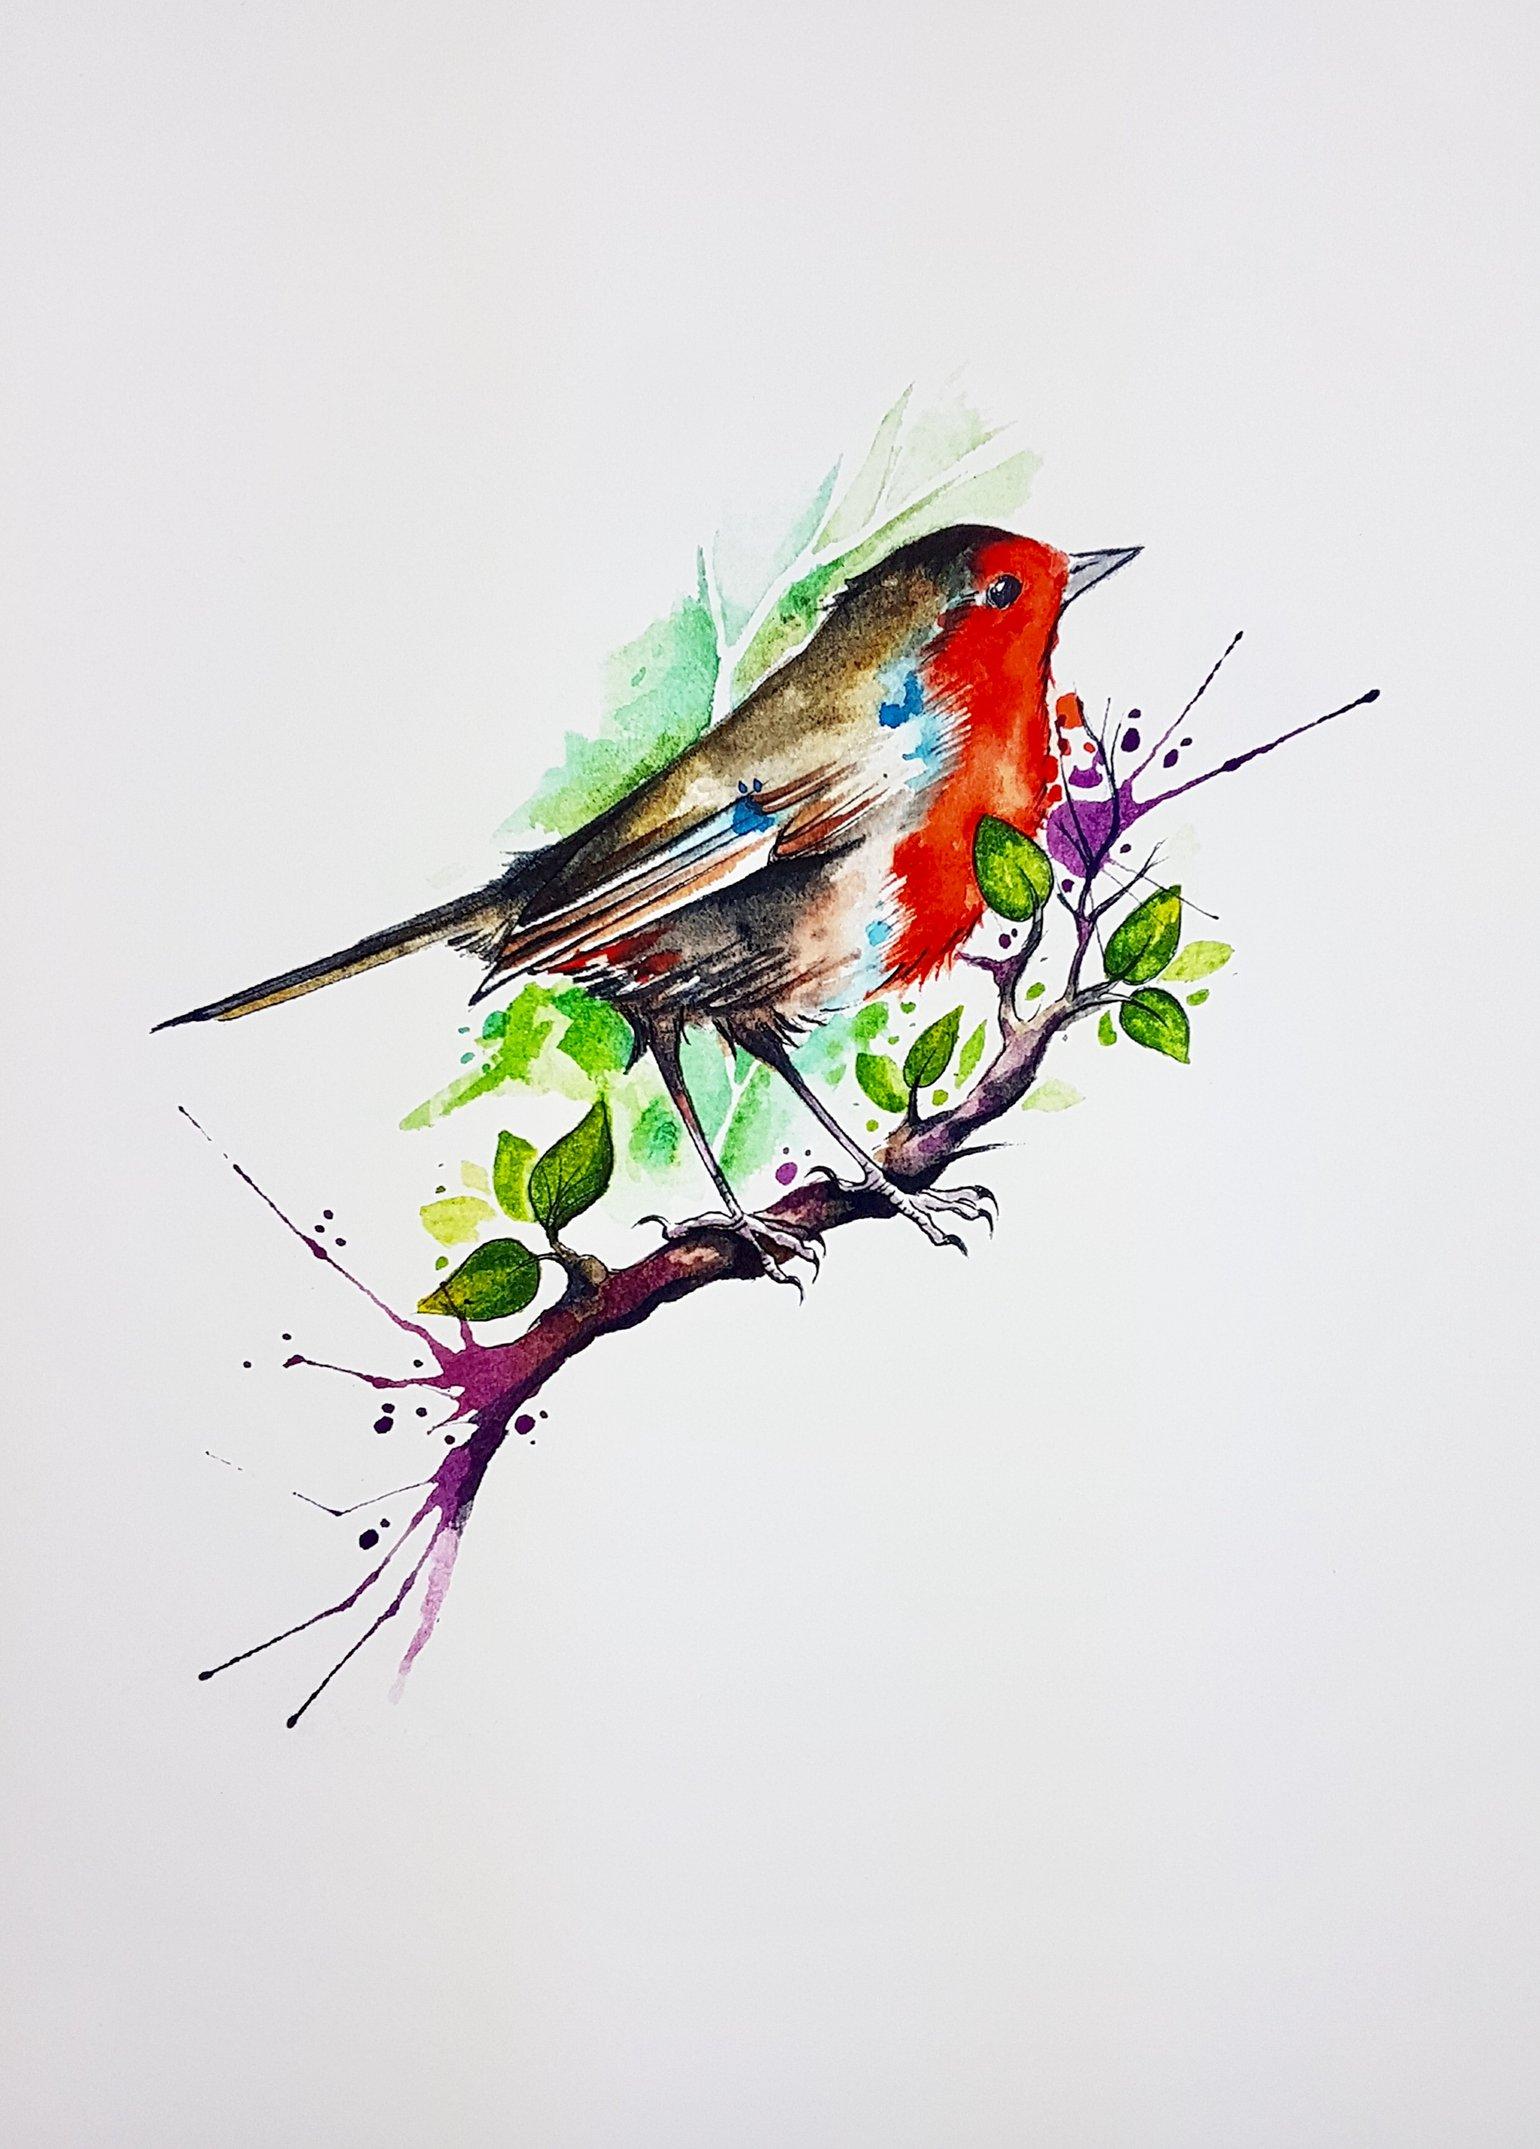 Image of Robin unframed A4 size